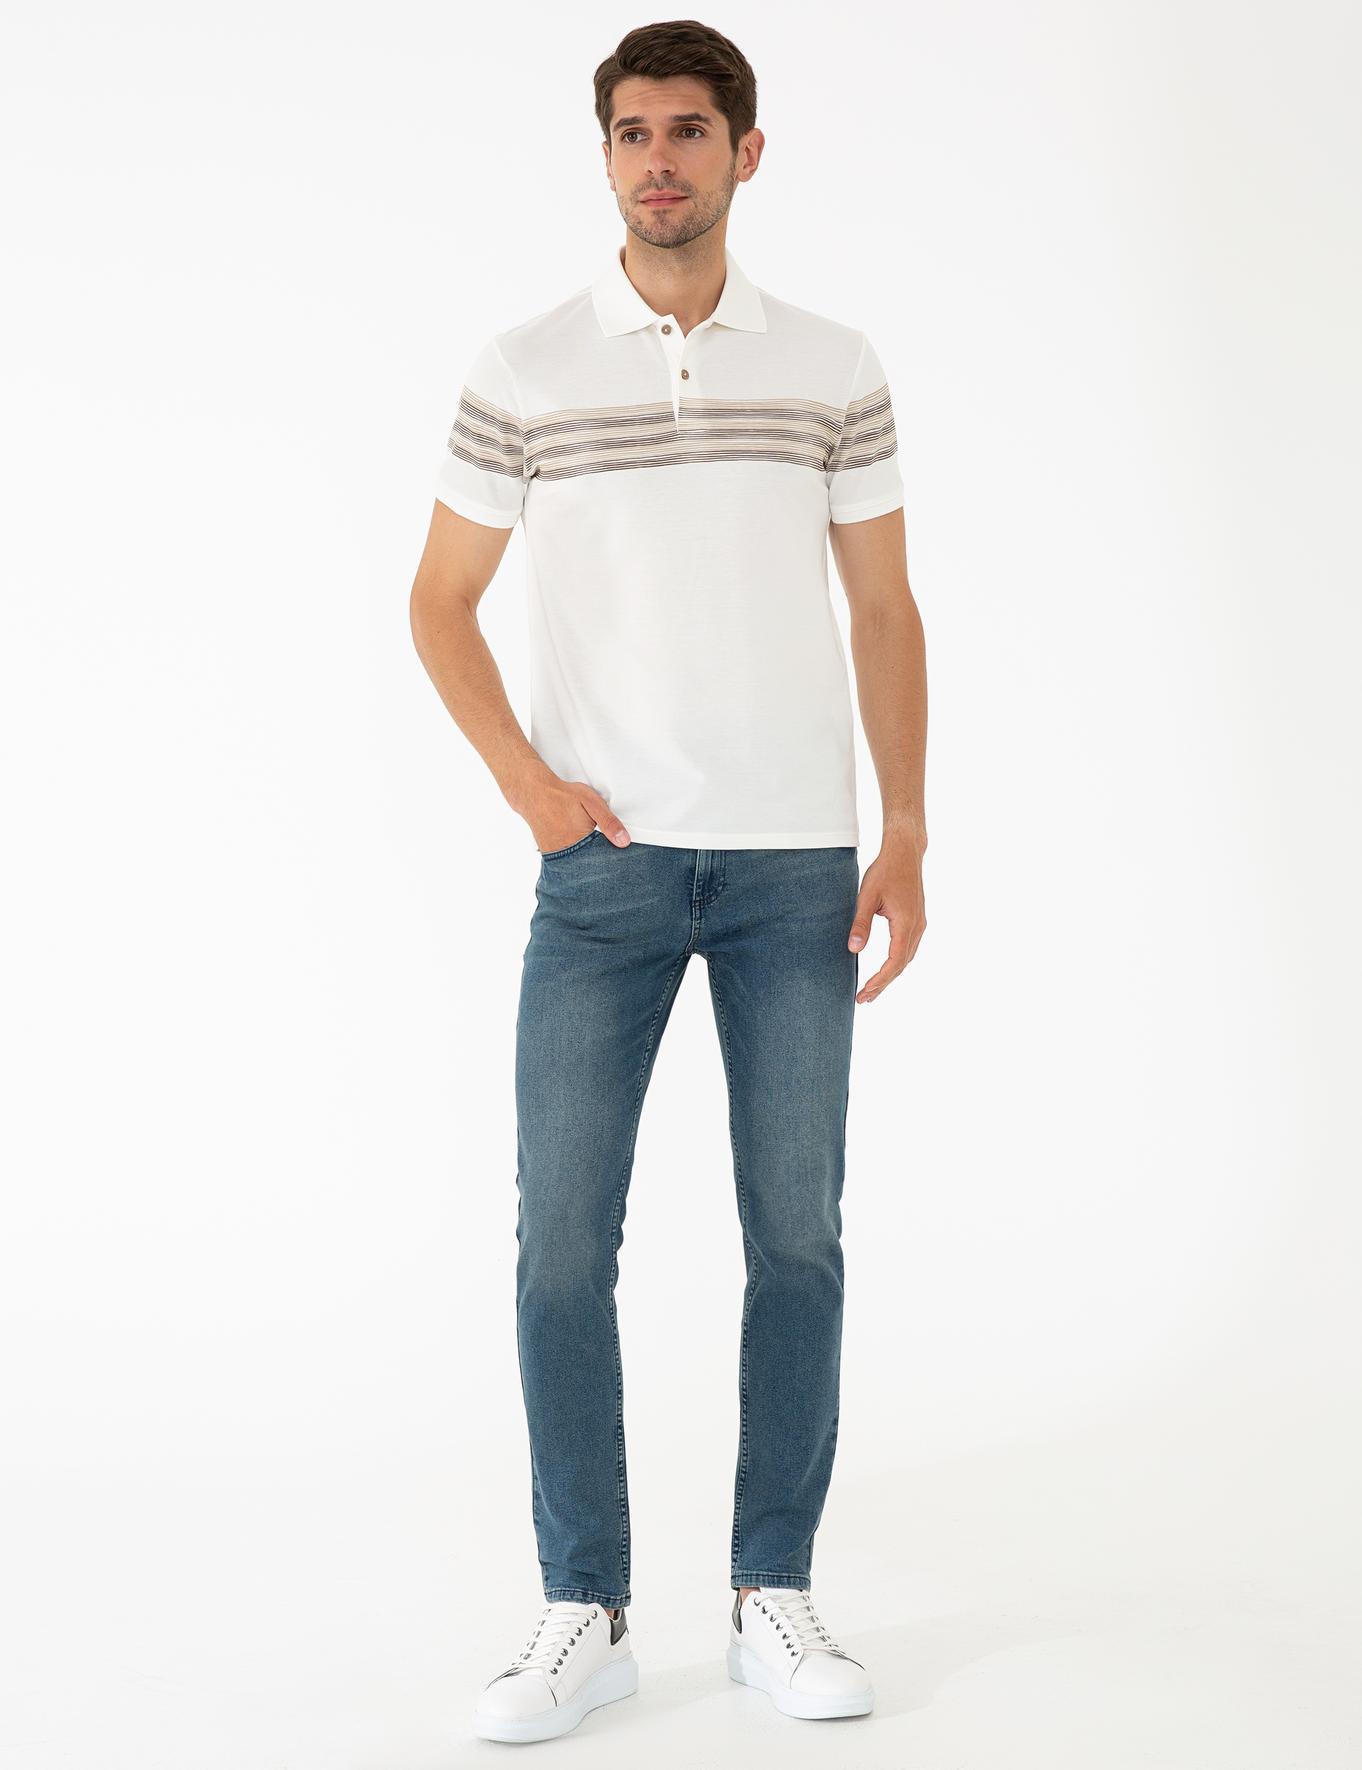 Açık Kahverengi Detaylı Beyaz Slim Fit Polo Yaka T-Shirt